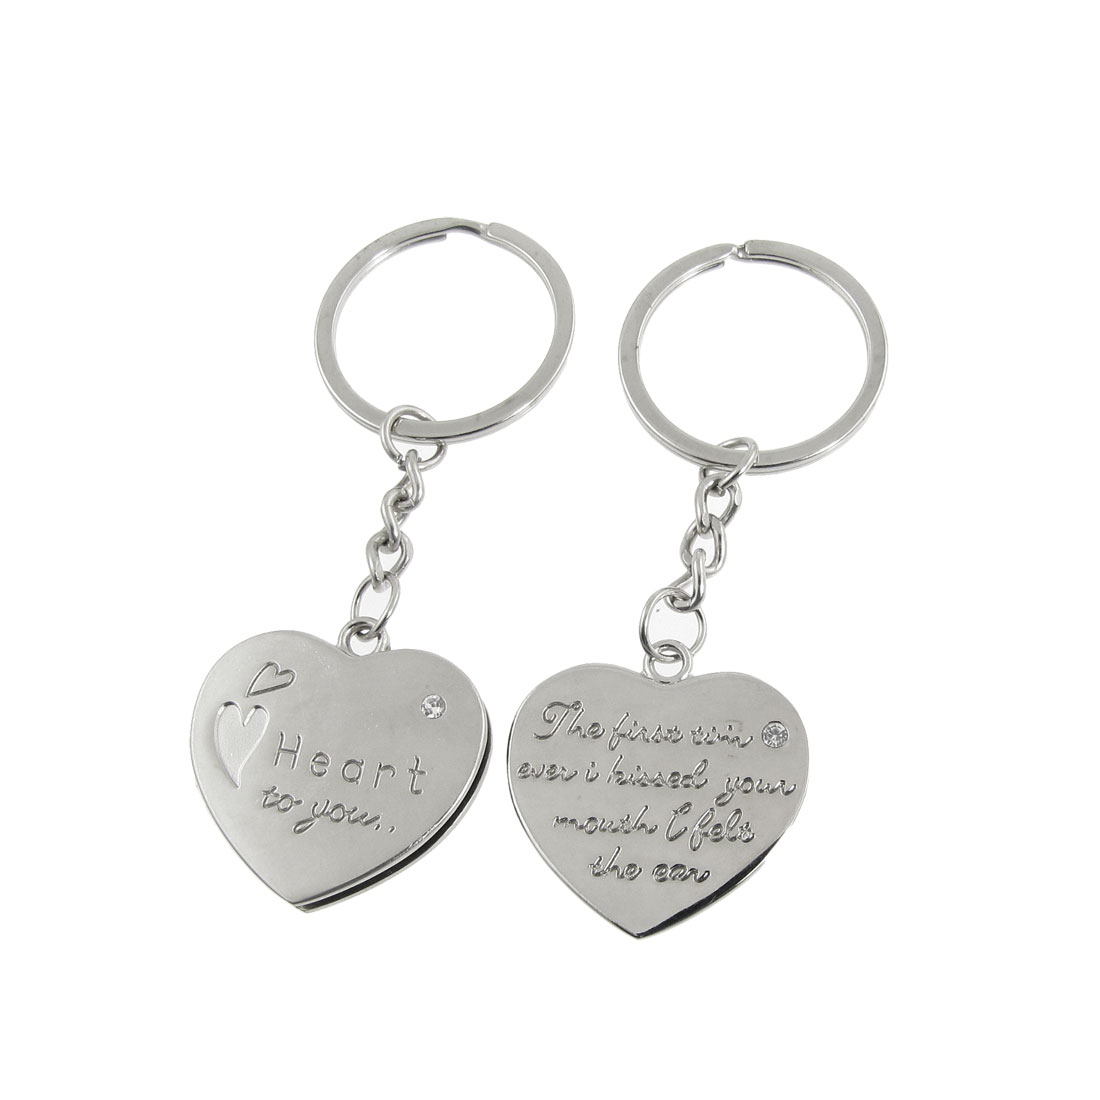 2 Pcs Faux Rhinestone Decor Heart Lover Couple Key Chain Keyring